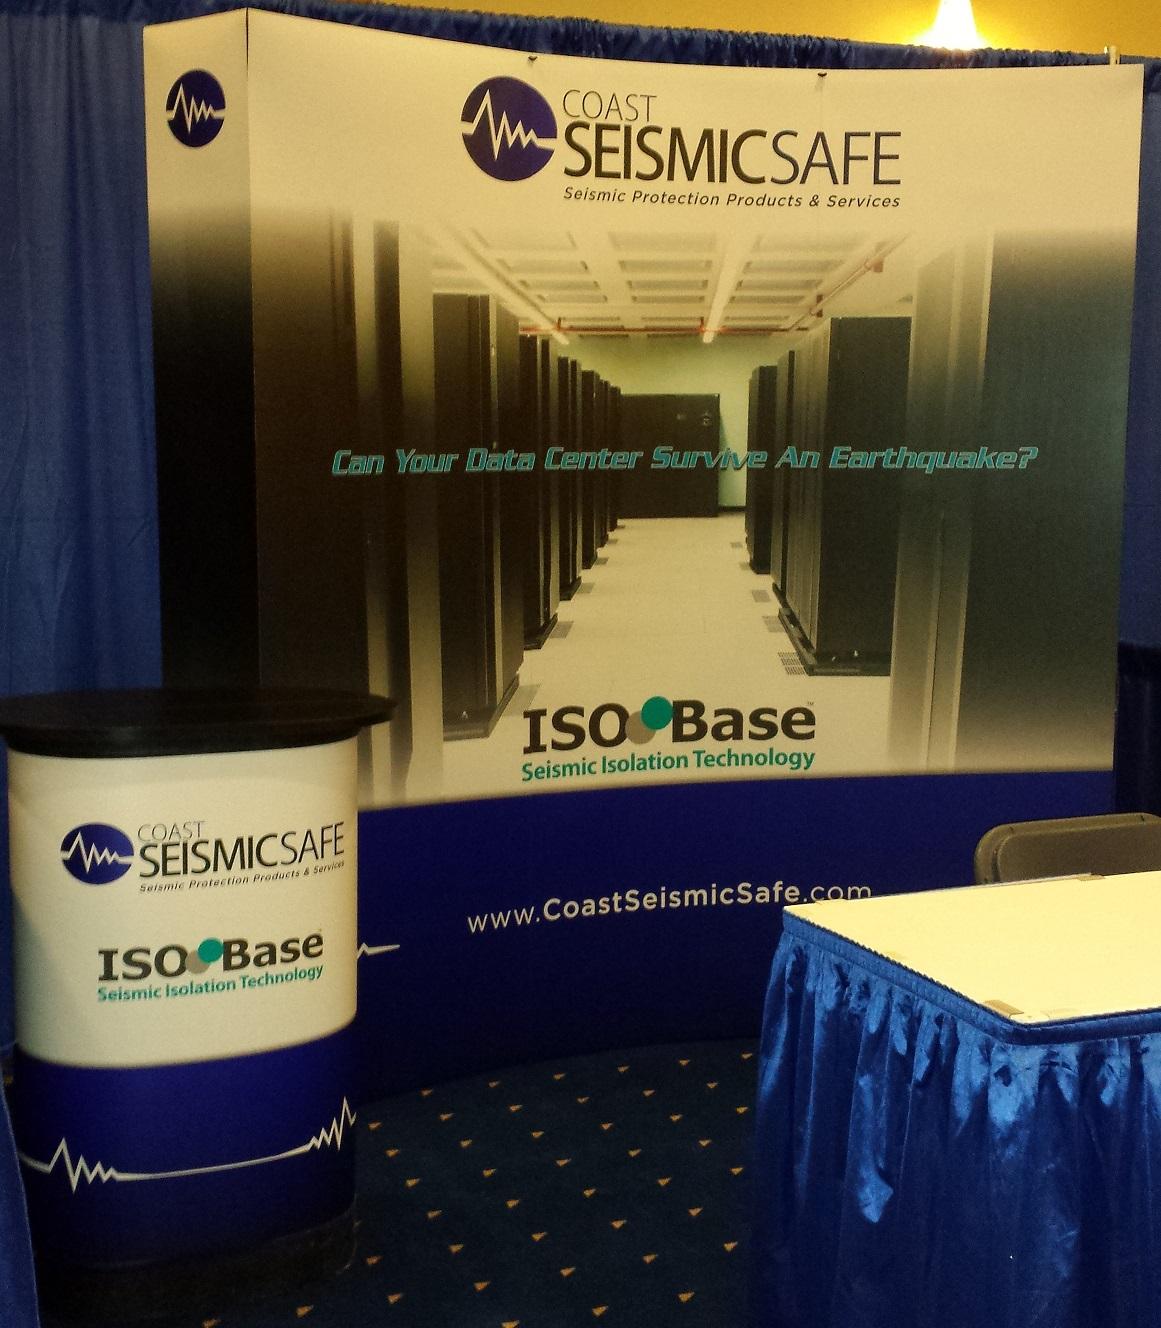 Coast_SeismicSafe_Inc_Booth